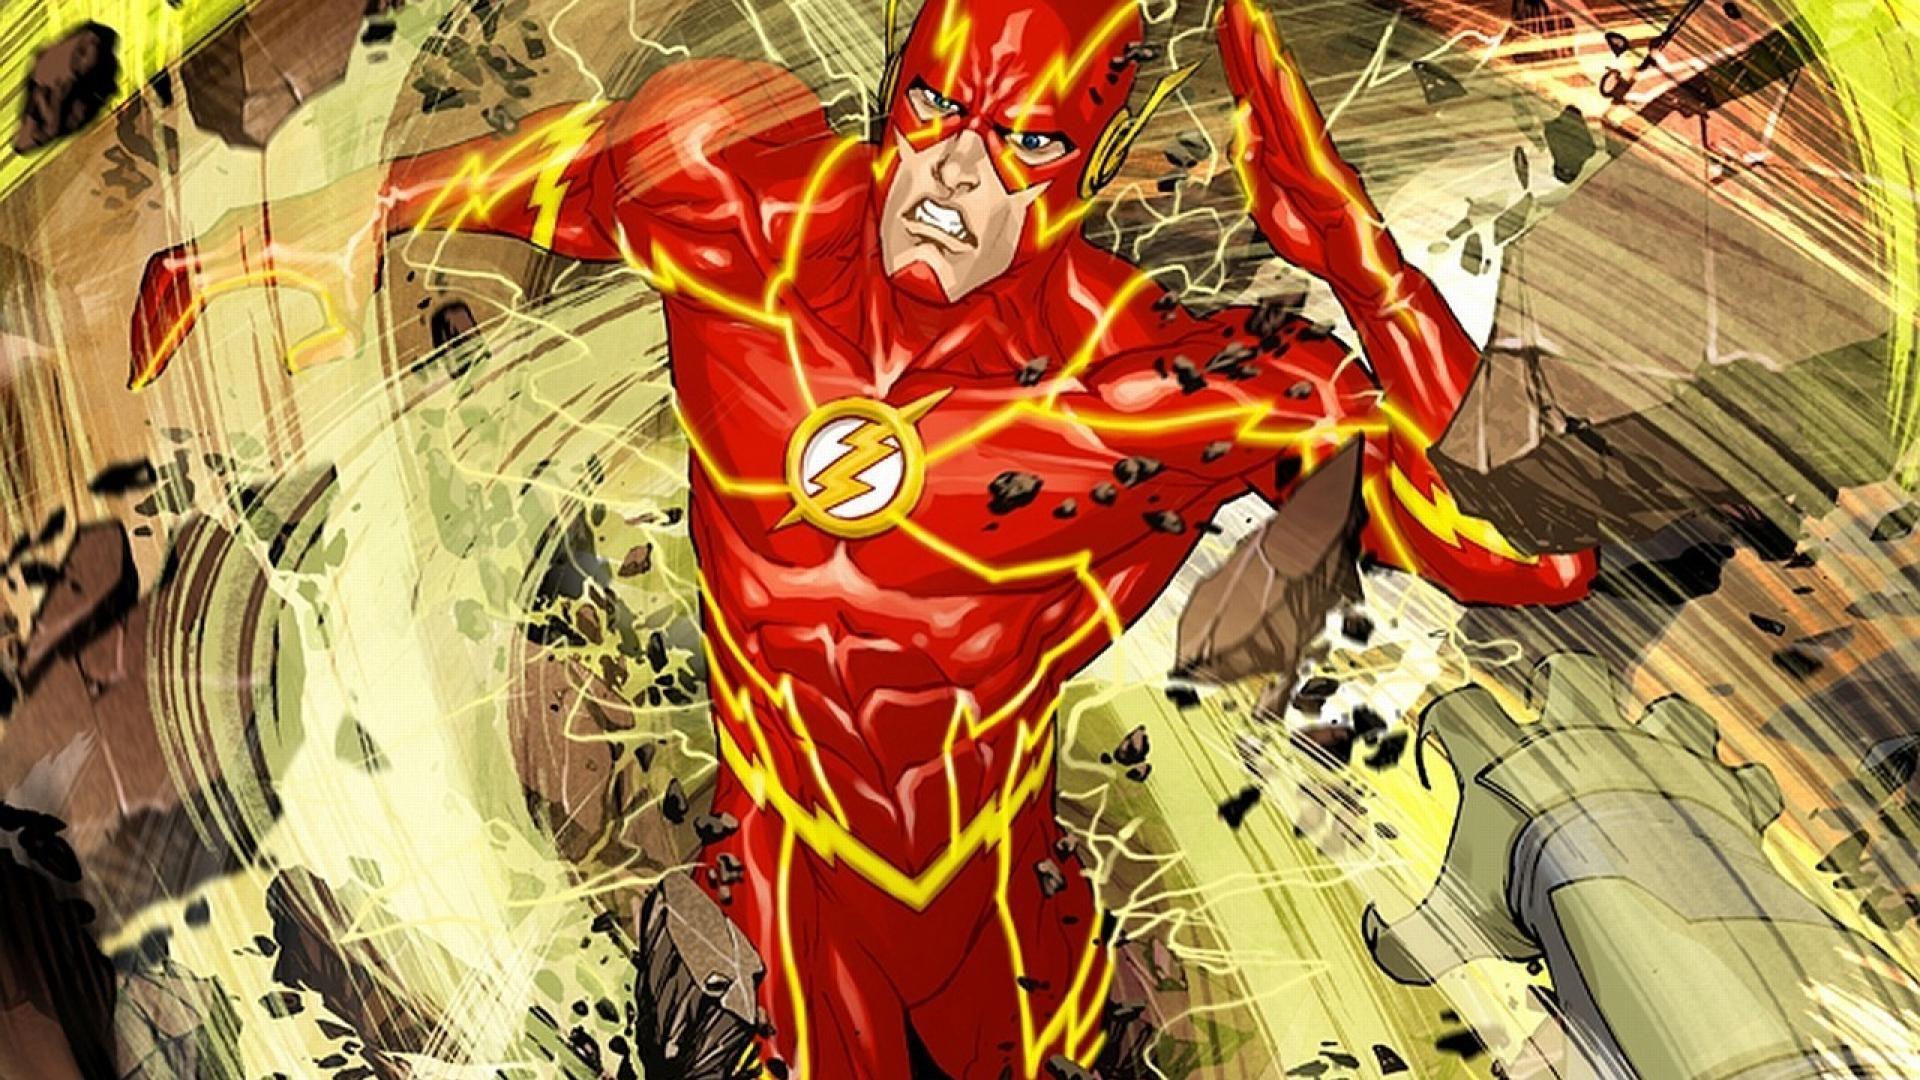 1920x1200 Justice League BW Black Superman Batman The Flash Green Lantern DC